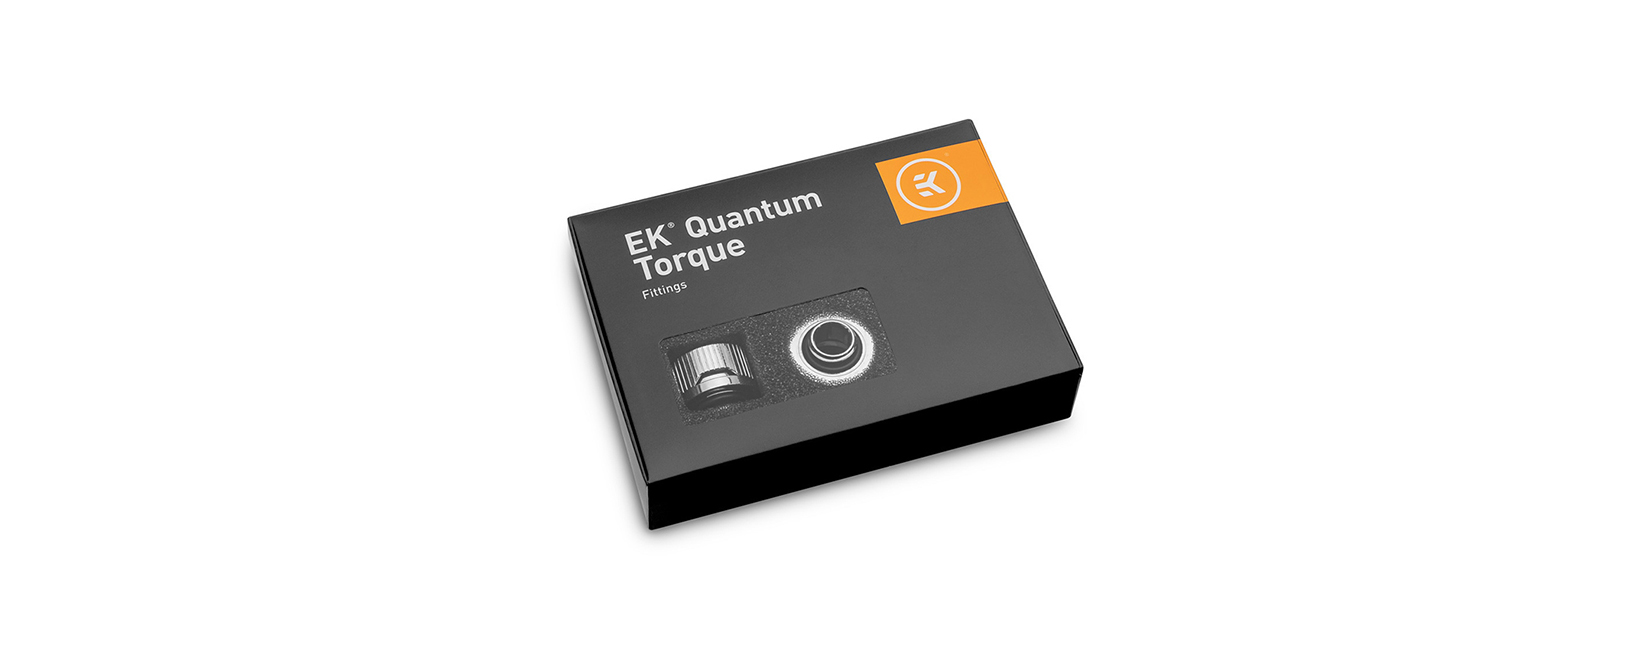 EK-Quantum Torque 6-Pack HTC 12 - Nickel